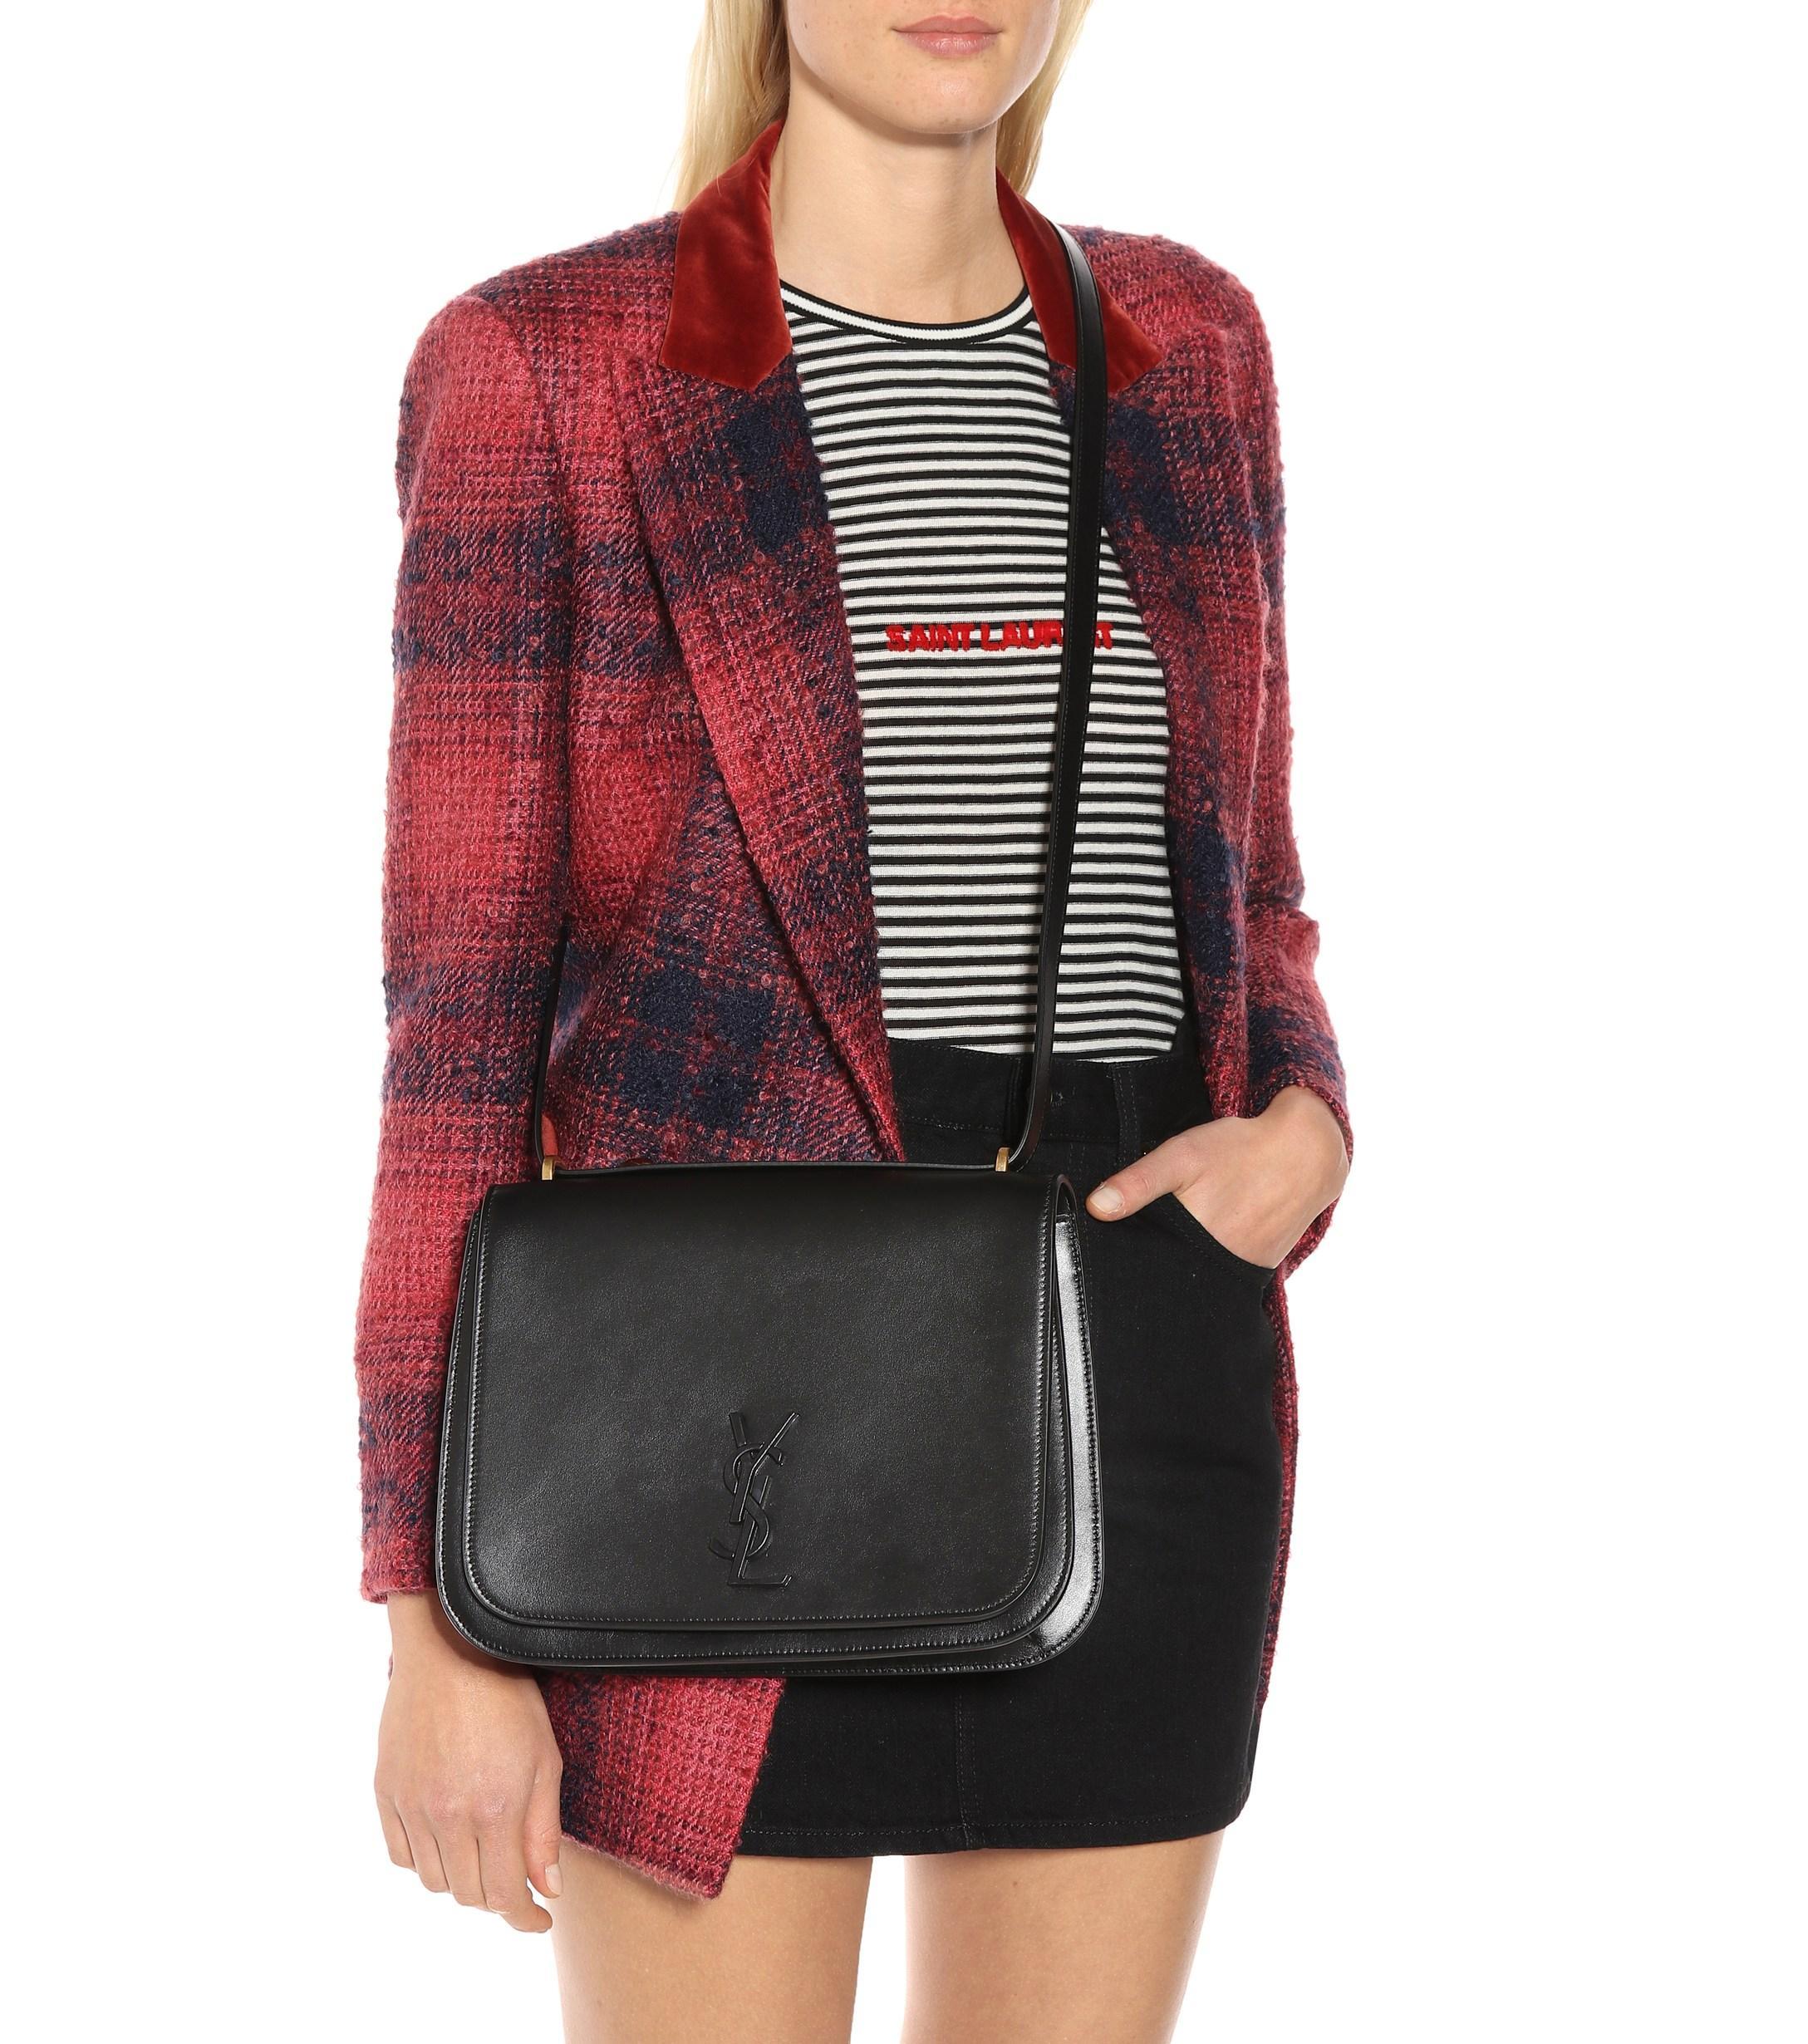 0e99a34398 Saint Laurent - Black Medium Spontini Leather Shoulder Bag - Lyst. View  fullscreen